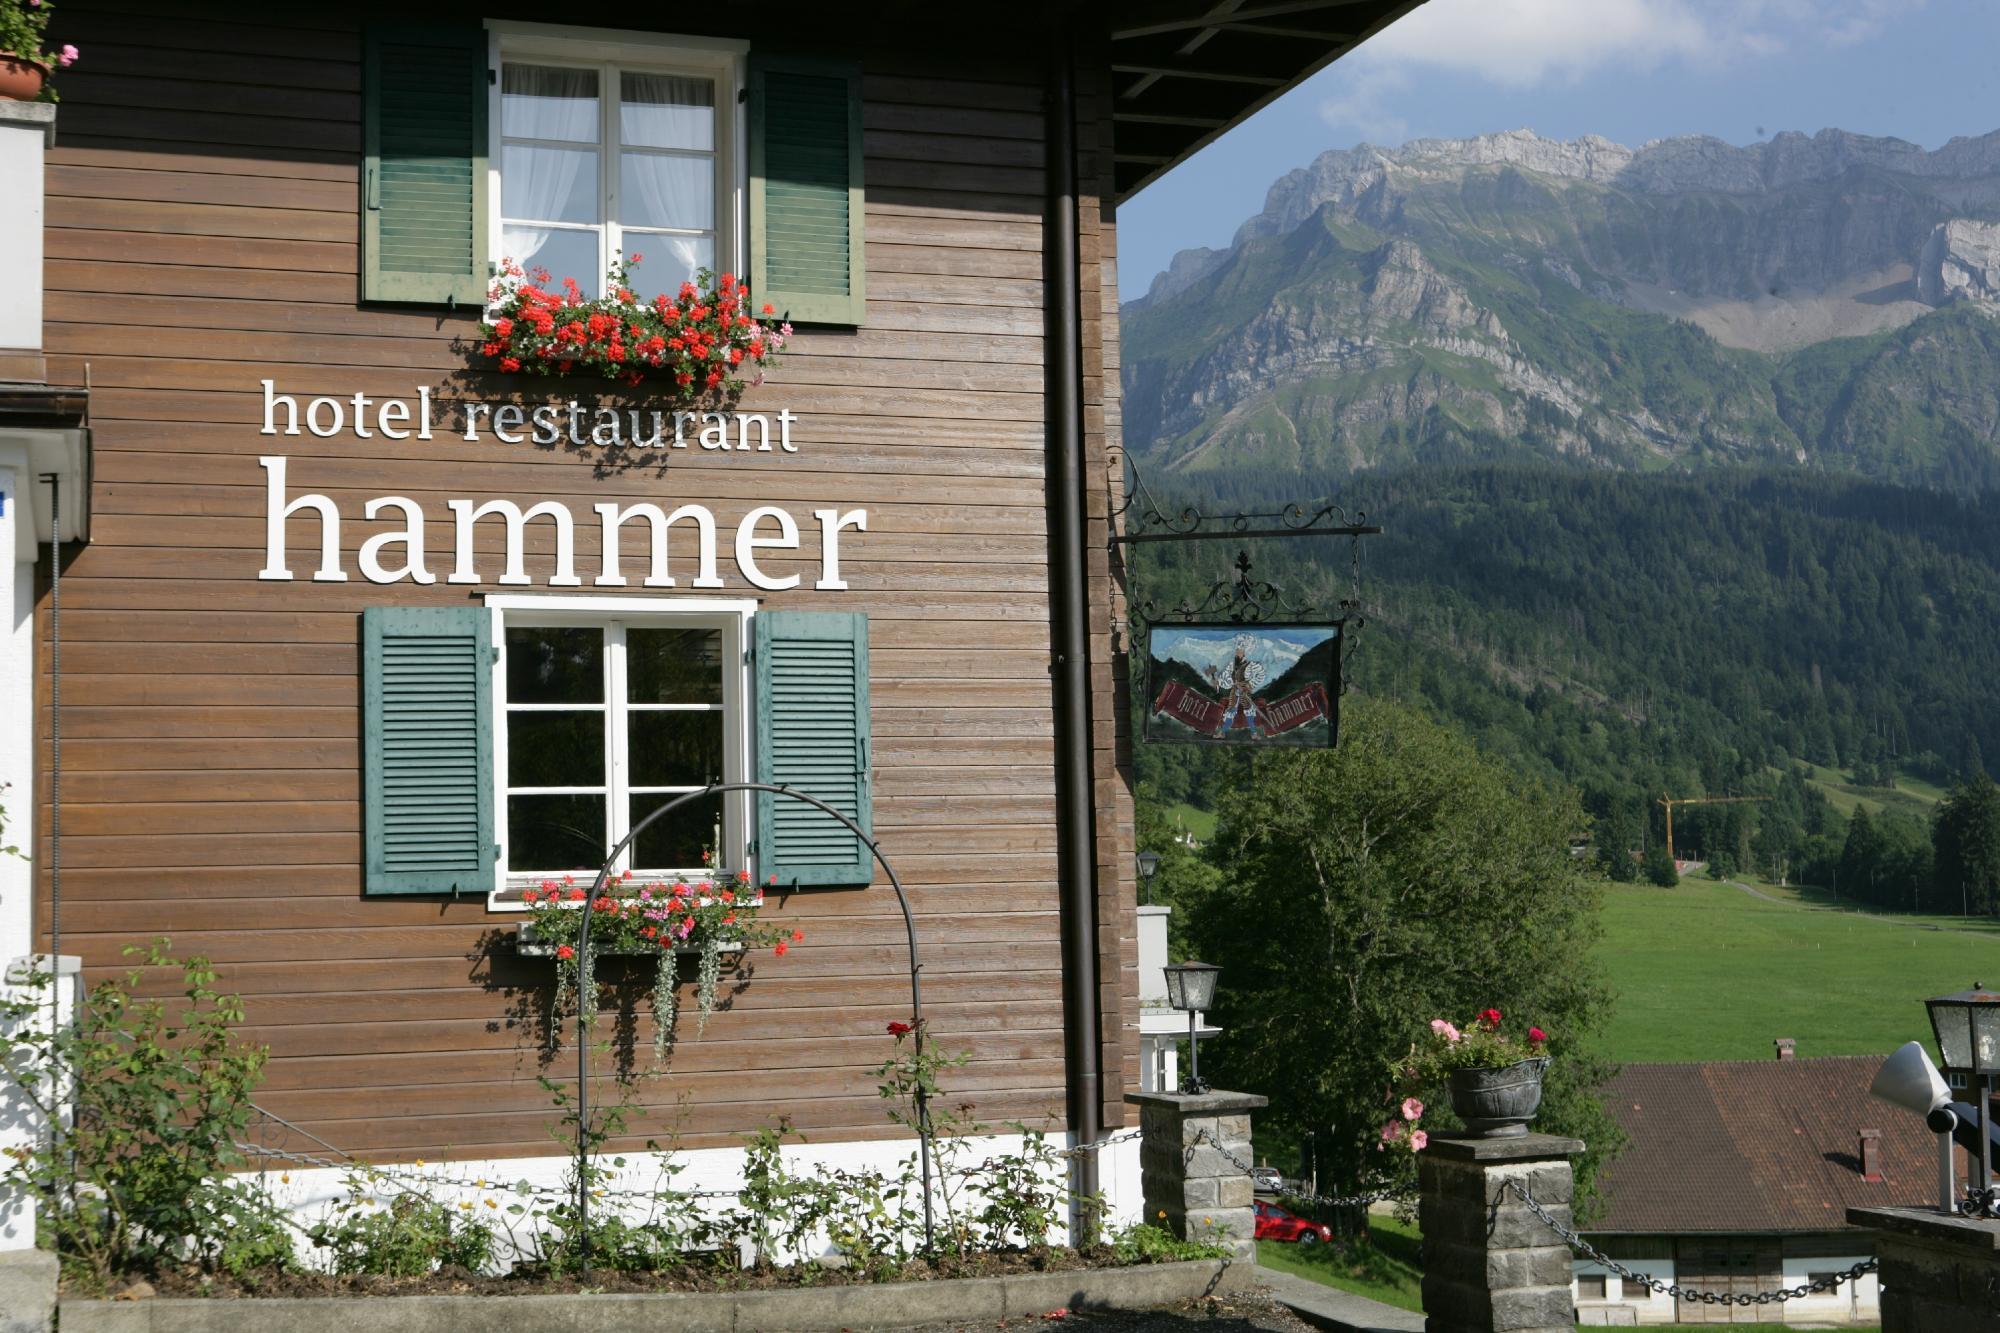 Hotel Restaurant Hammer